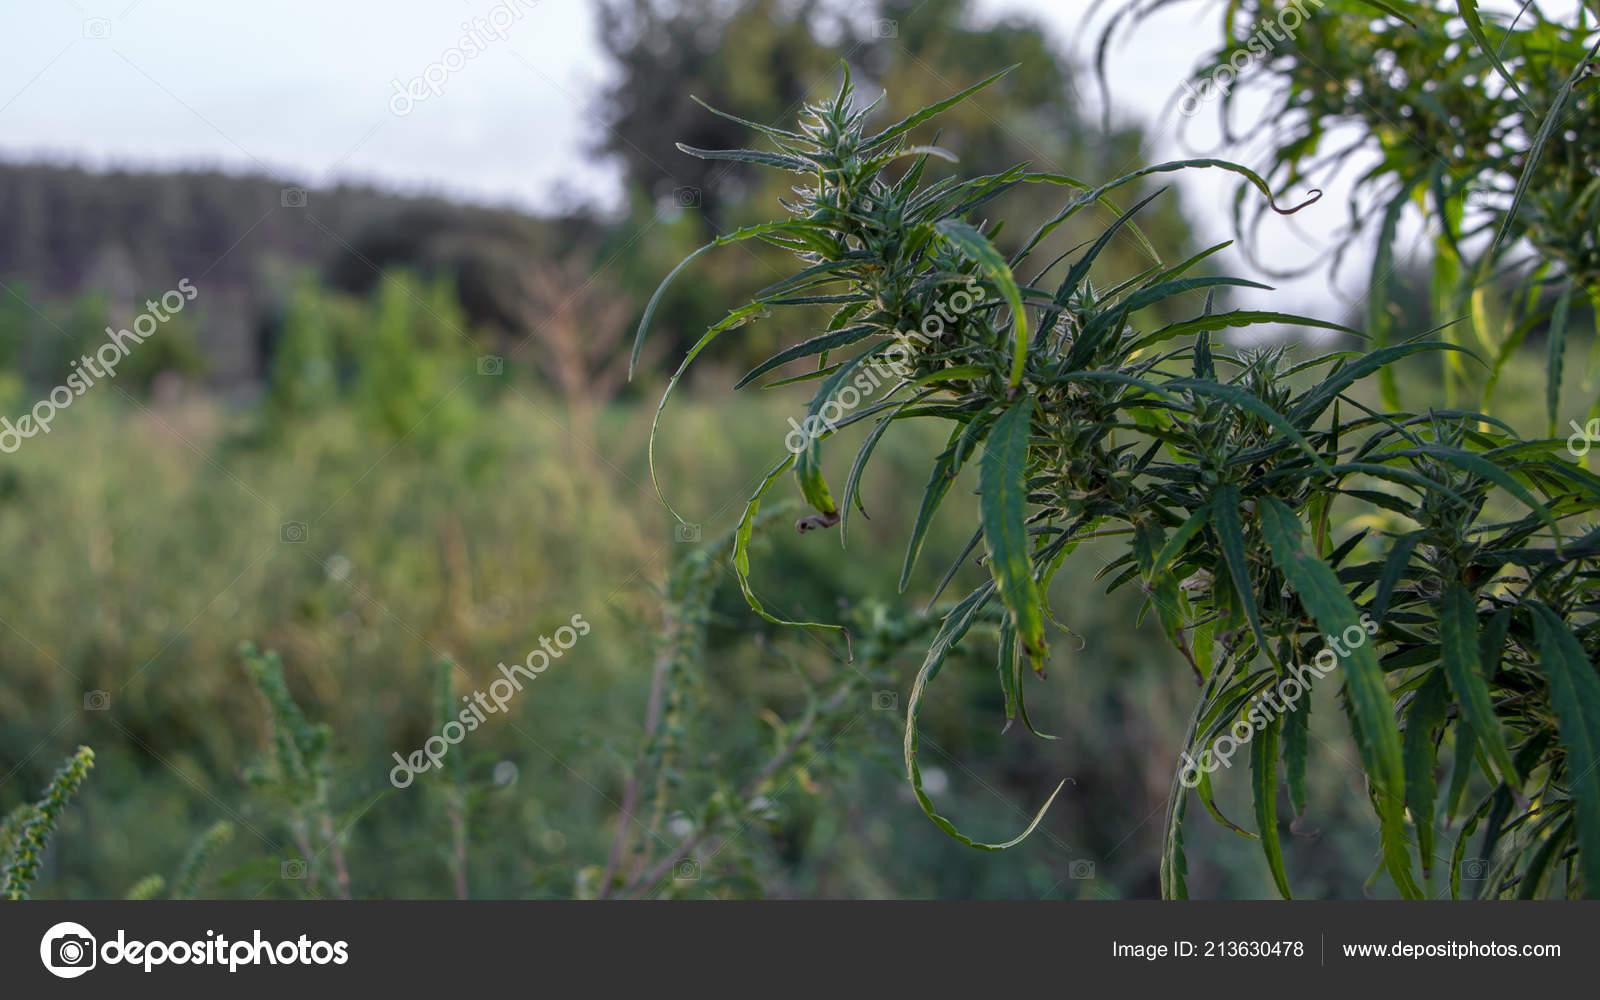 Семена конопли созрели кепка с коноплей